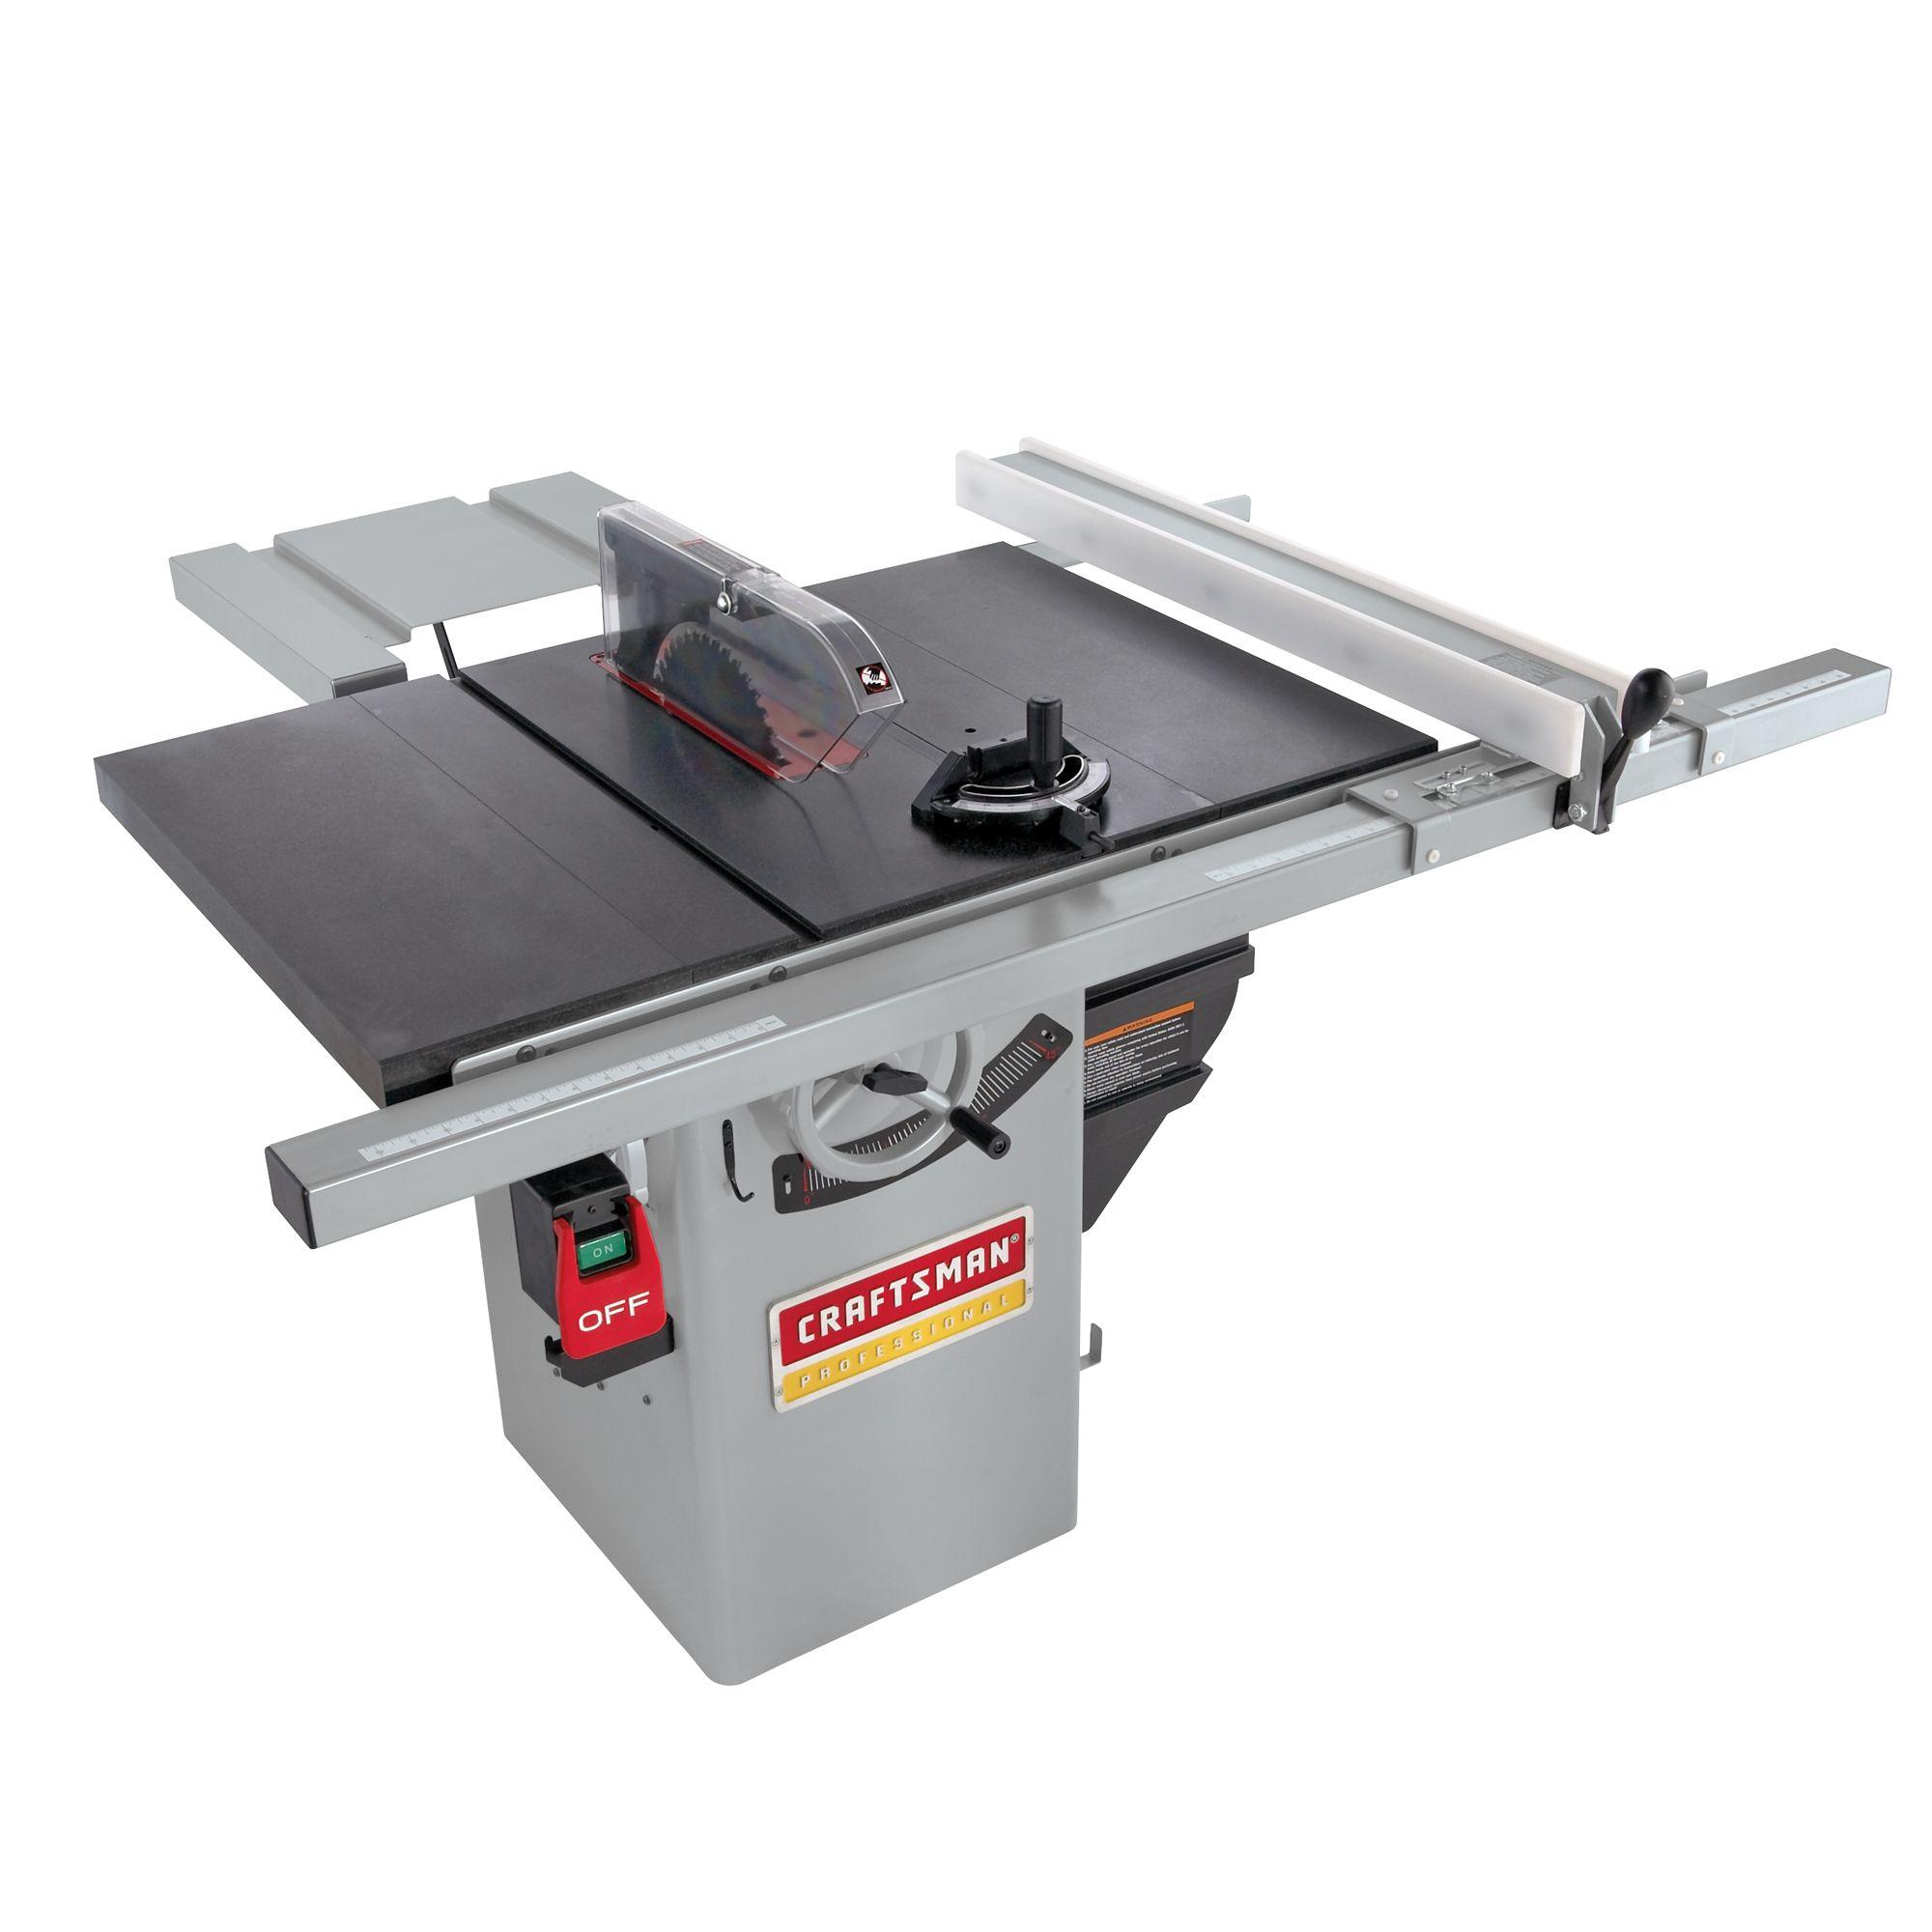 "Craftsman Professional 134 Hp Premium Hybrid 10"" Table"